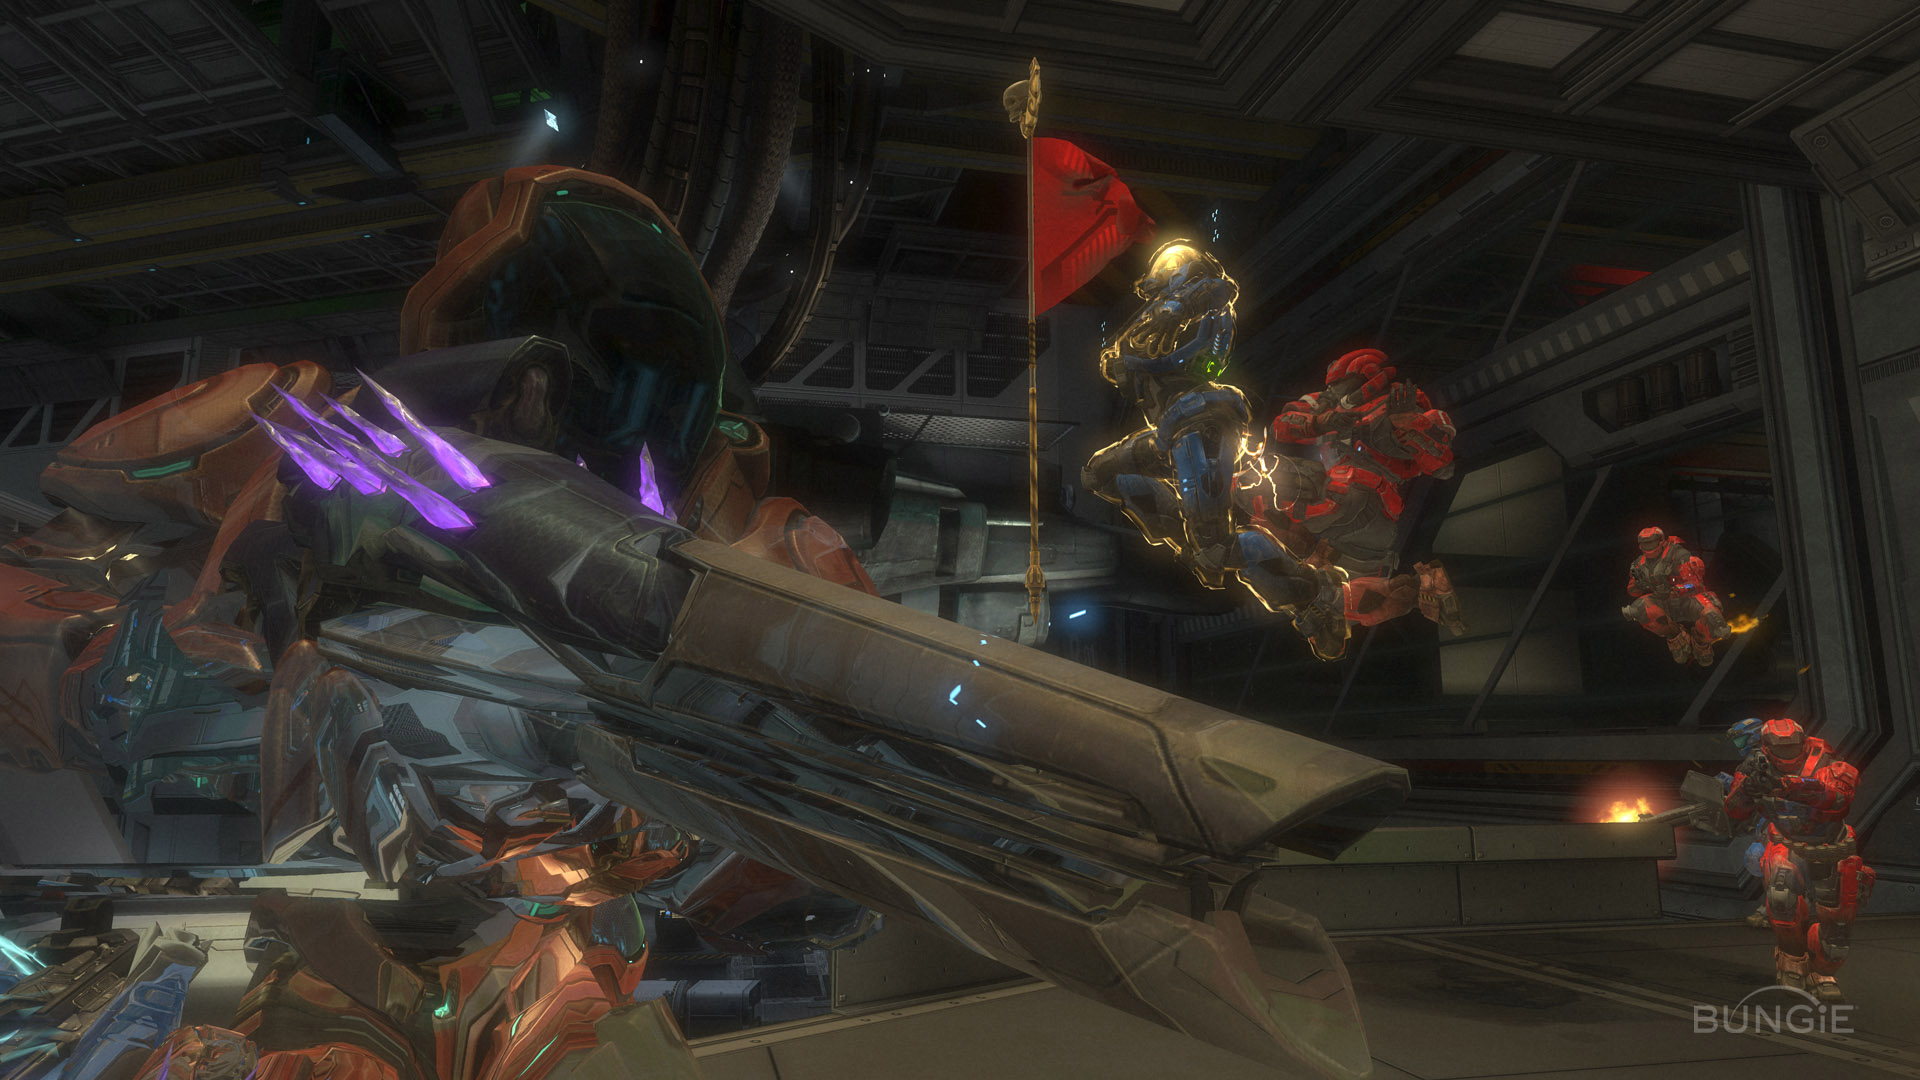 Halo Reach DLC Achievements